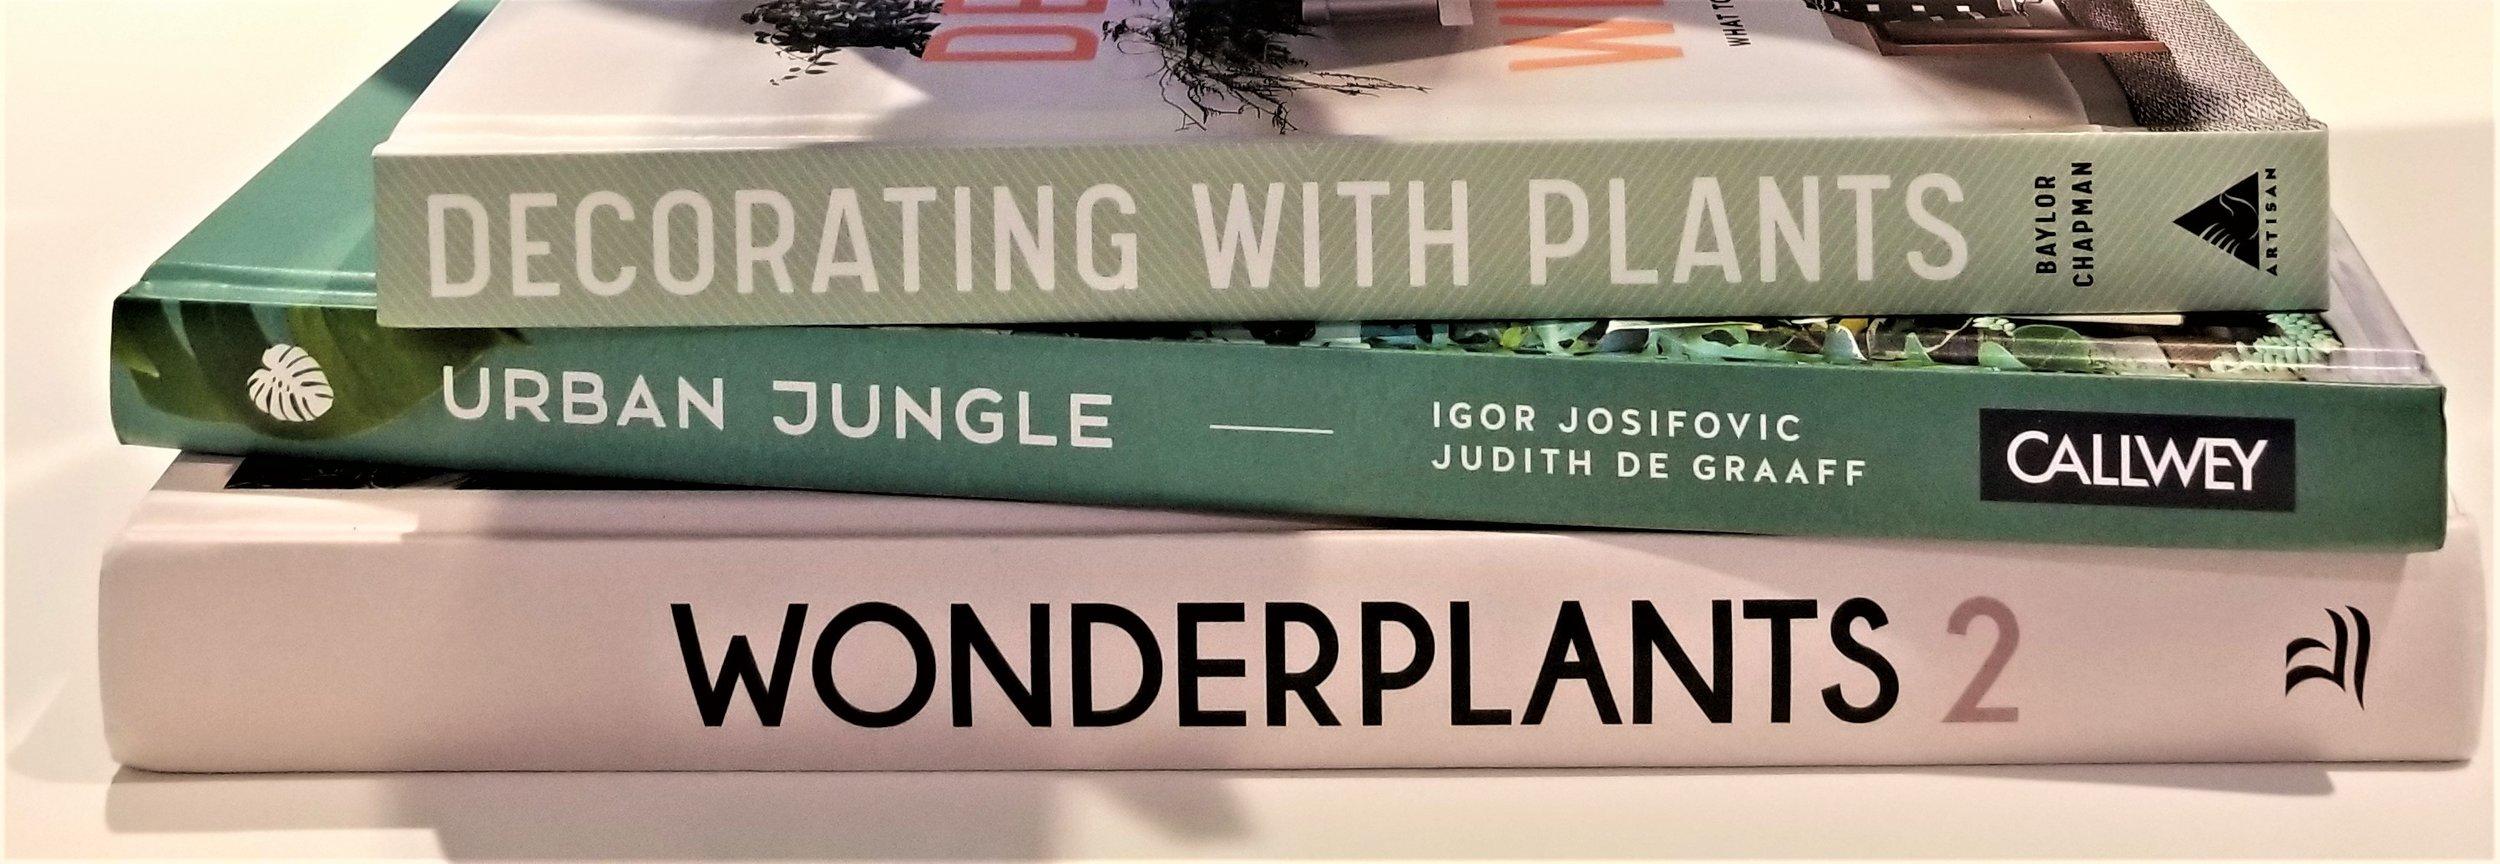 Decorating with Plants  , Baylor Chapman;   Urban Jungle  , Igor Josifovic and Judith De Graaff; and   Wonderplants 2  , Irene Schampaert and Judith Baehner